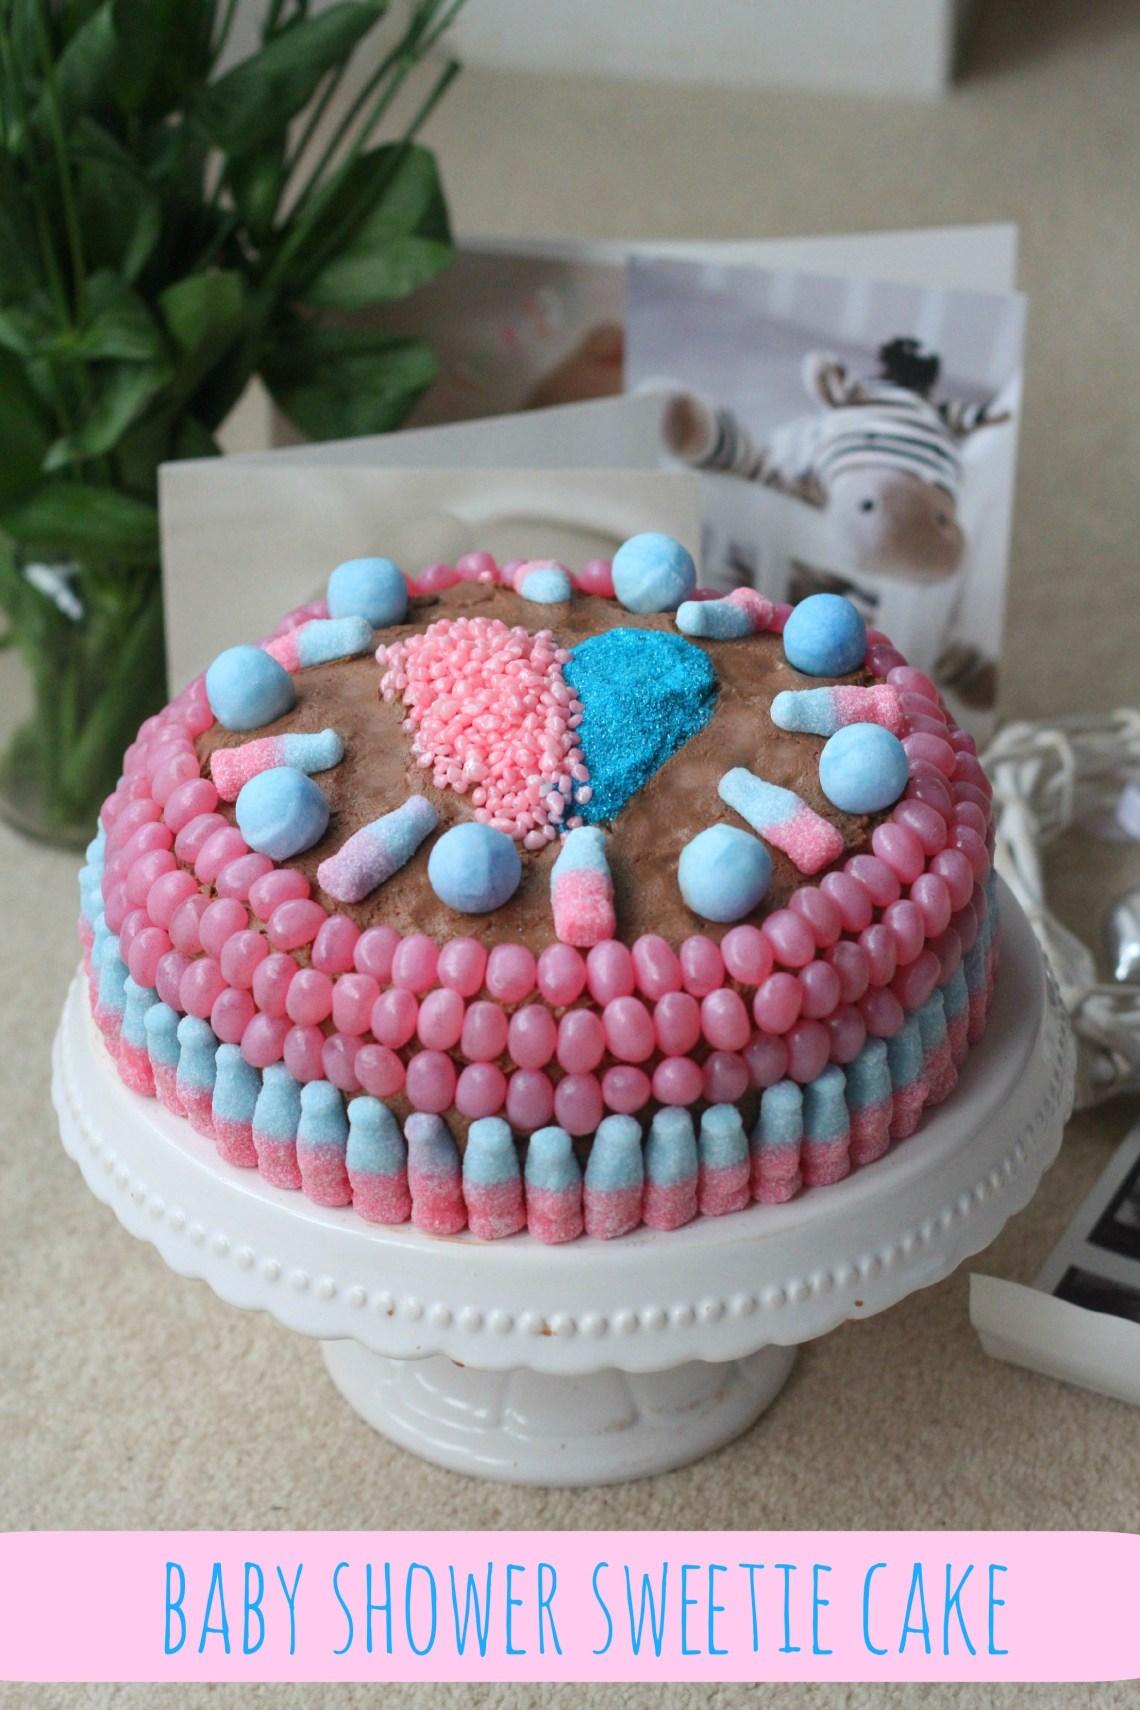 Baby Shower Sweetie Cake (uni-sex)